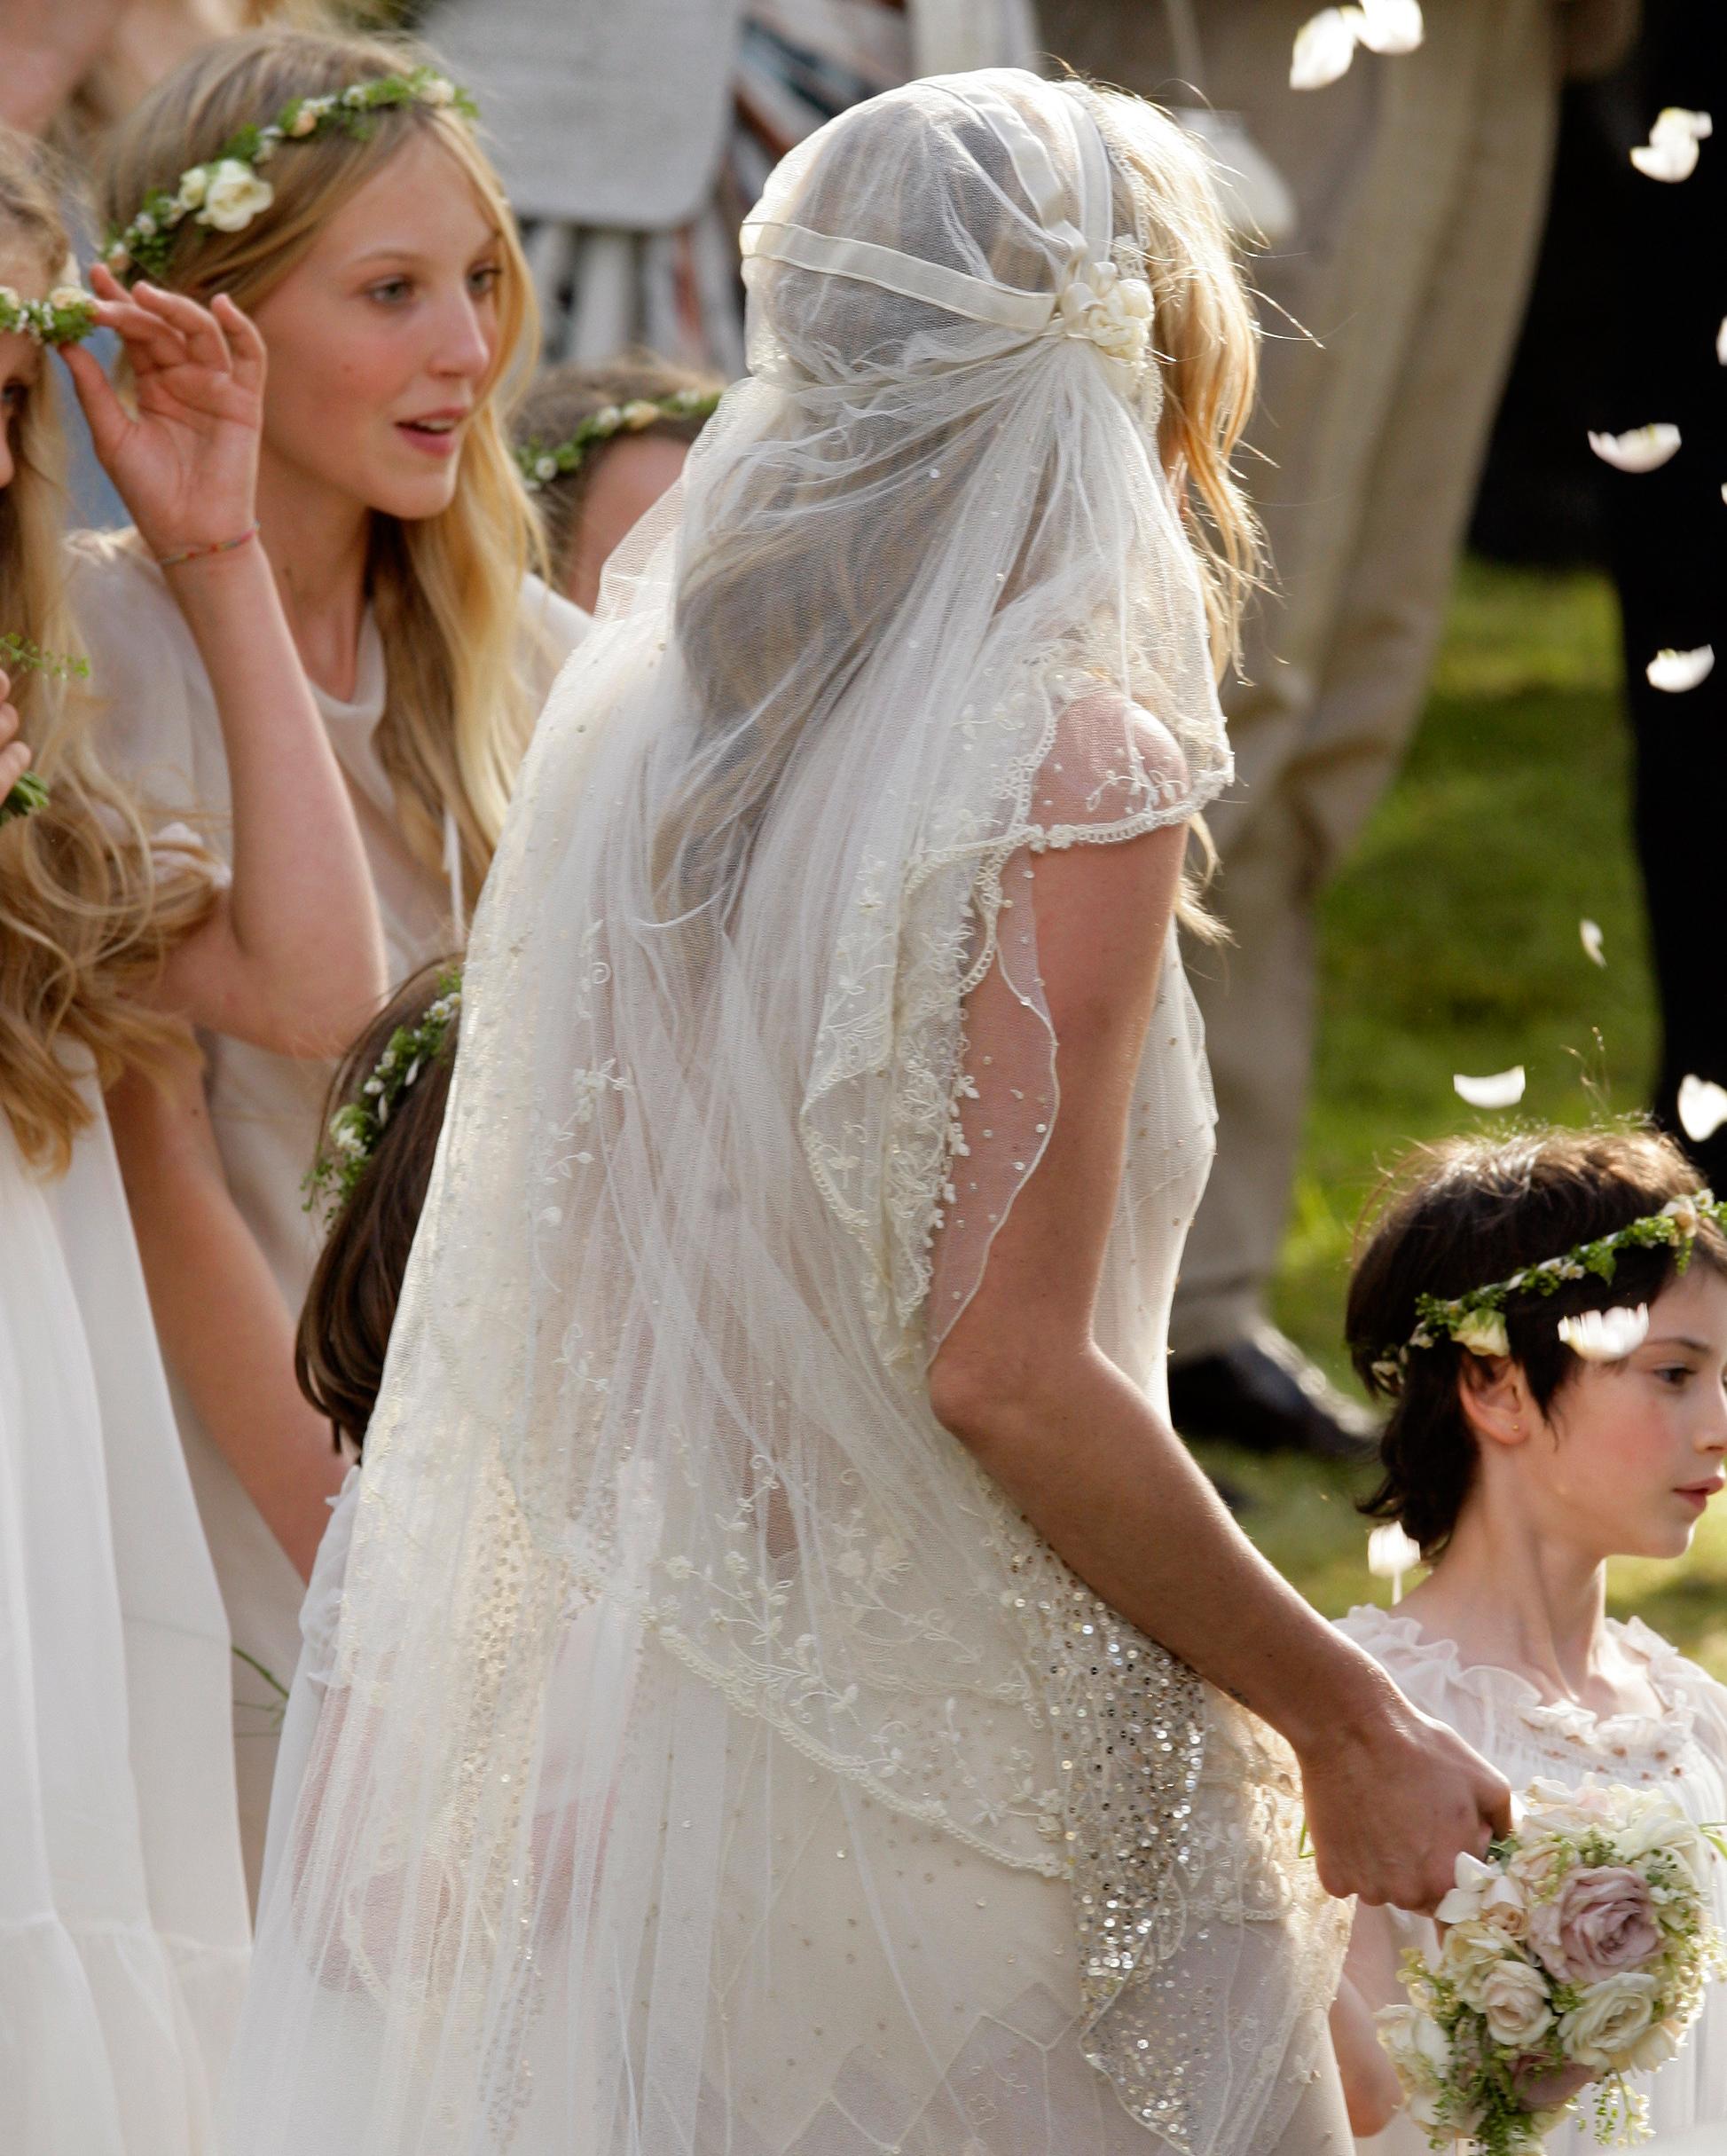 celebrity-brides-veils-kate-moss-jamie-hince-0615.jpg